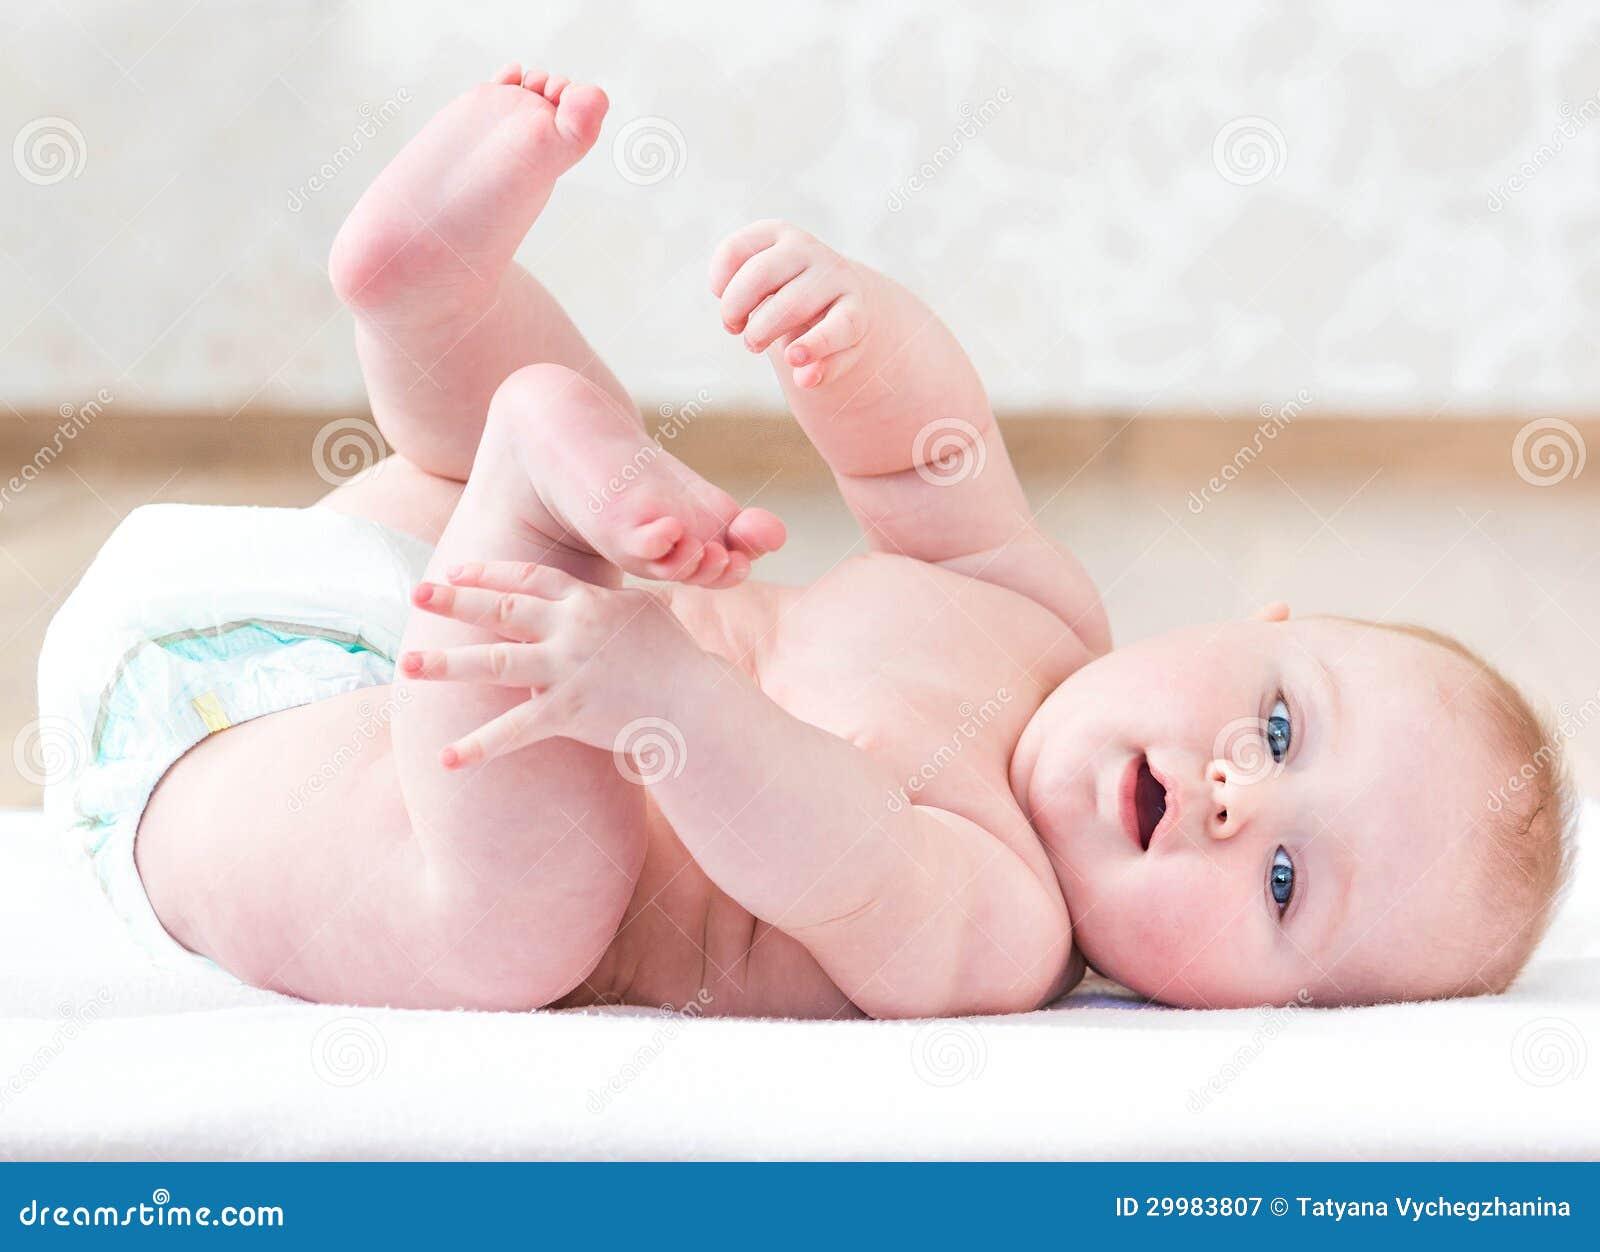 or babys Sexy naked photos